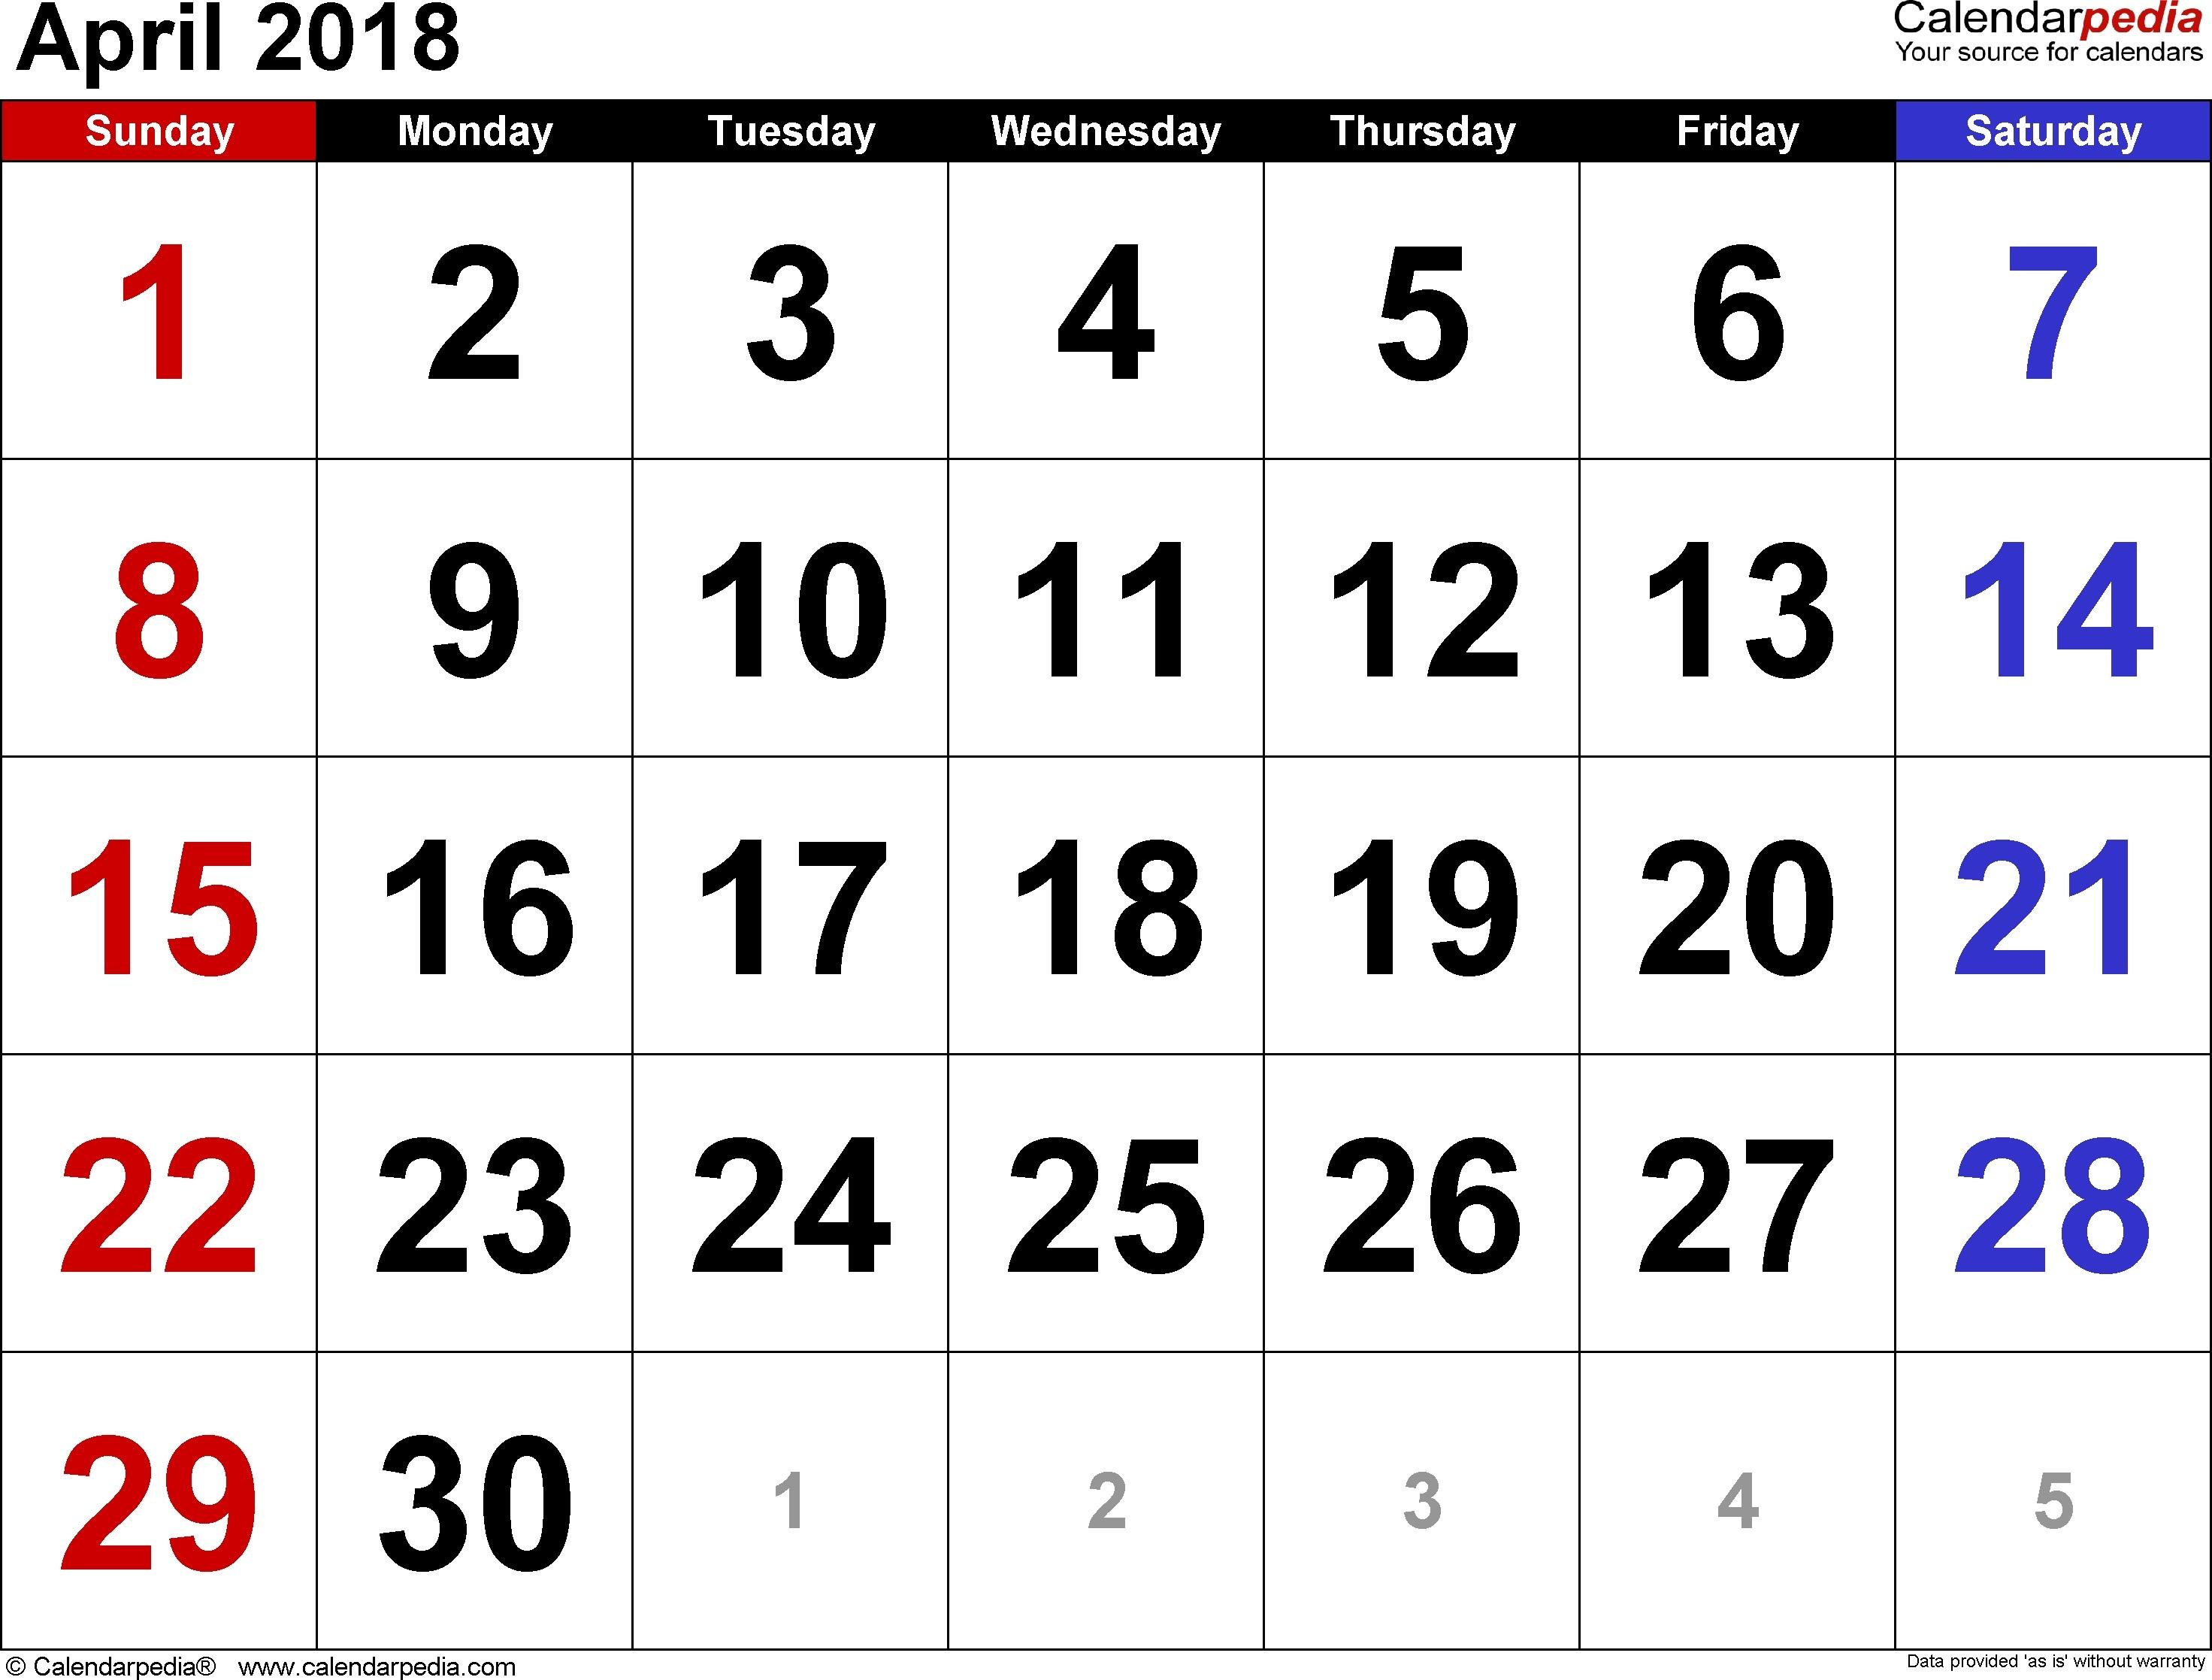 Calendar April 2018 Png - Calendar April PNG